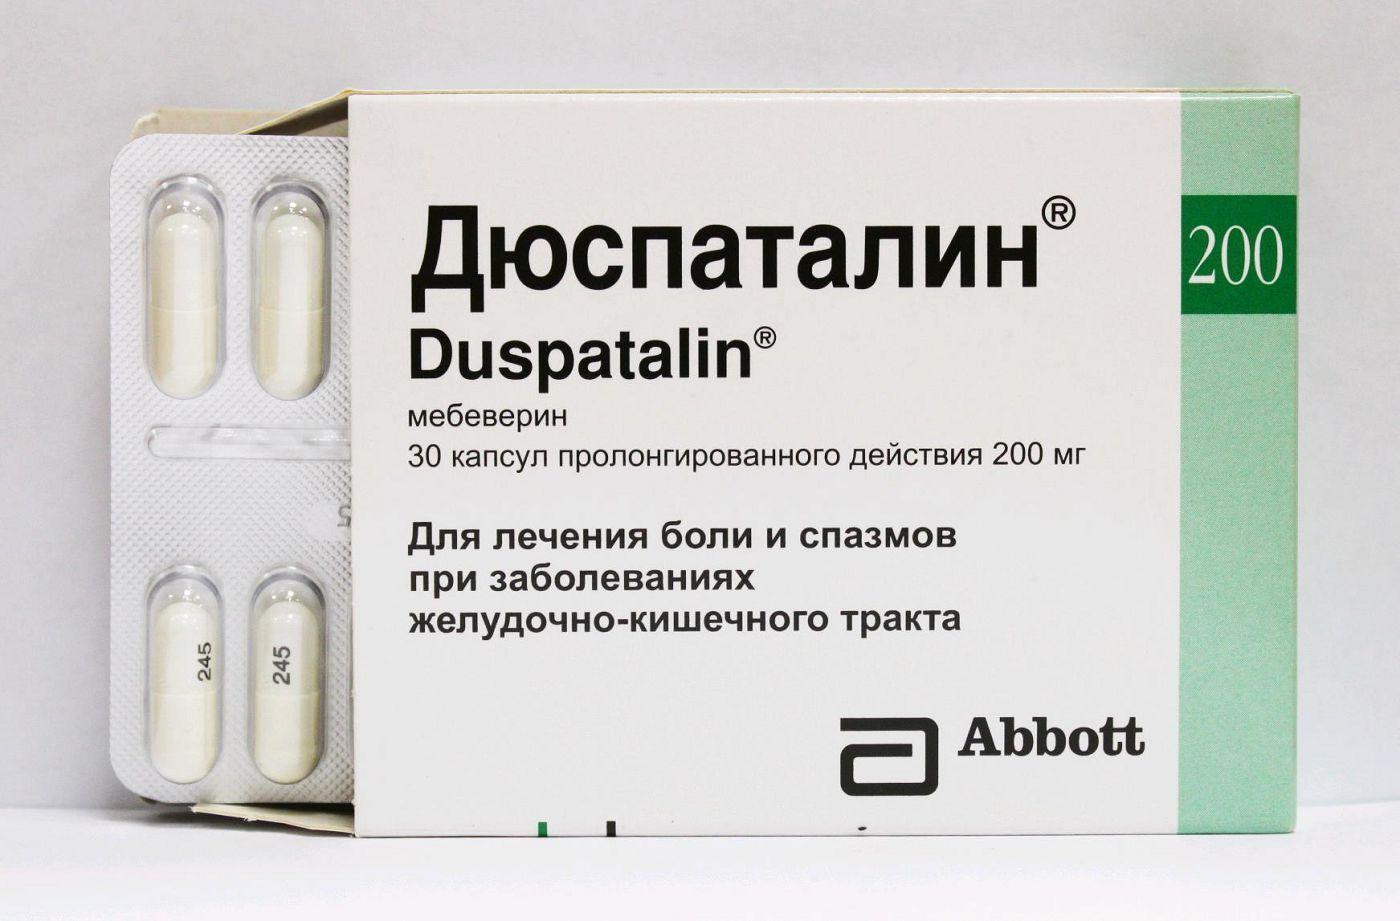 Дюспаталин устраняет болевой дискомфорт при панкреатите